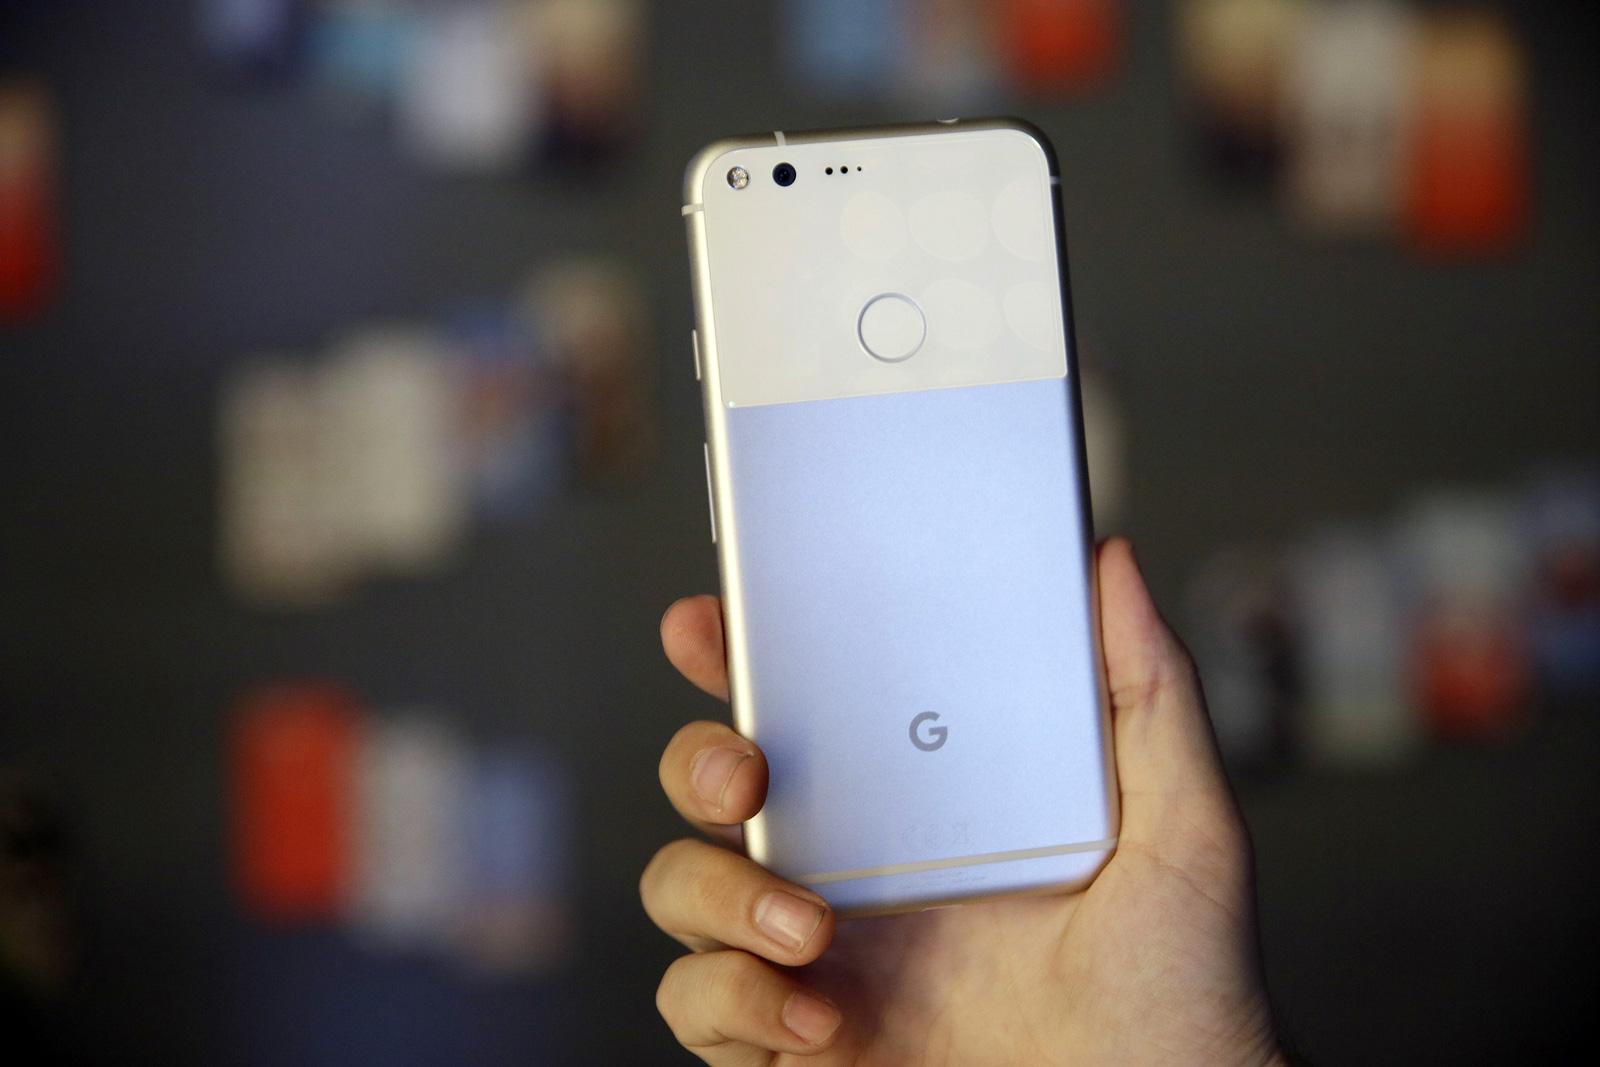 Pixel XL Vs iPhone 7 Plus